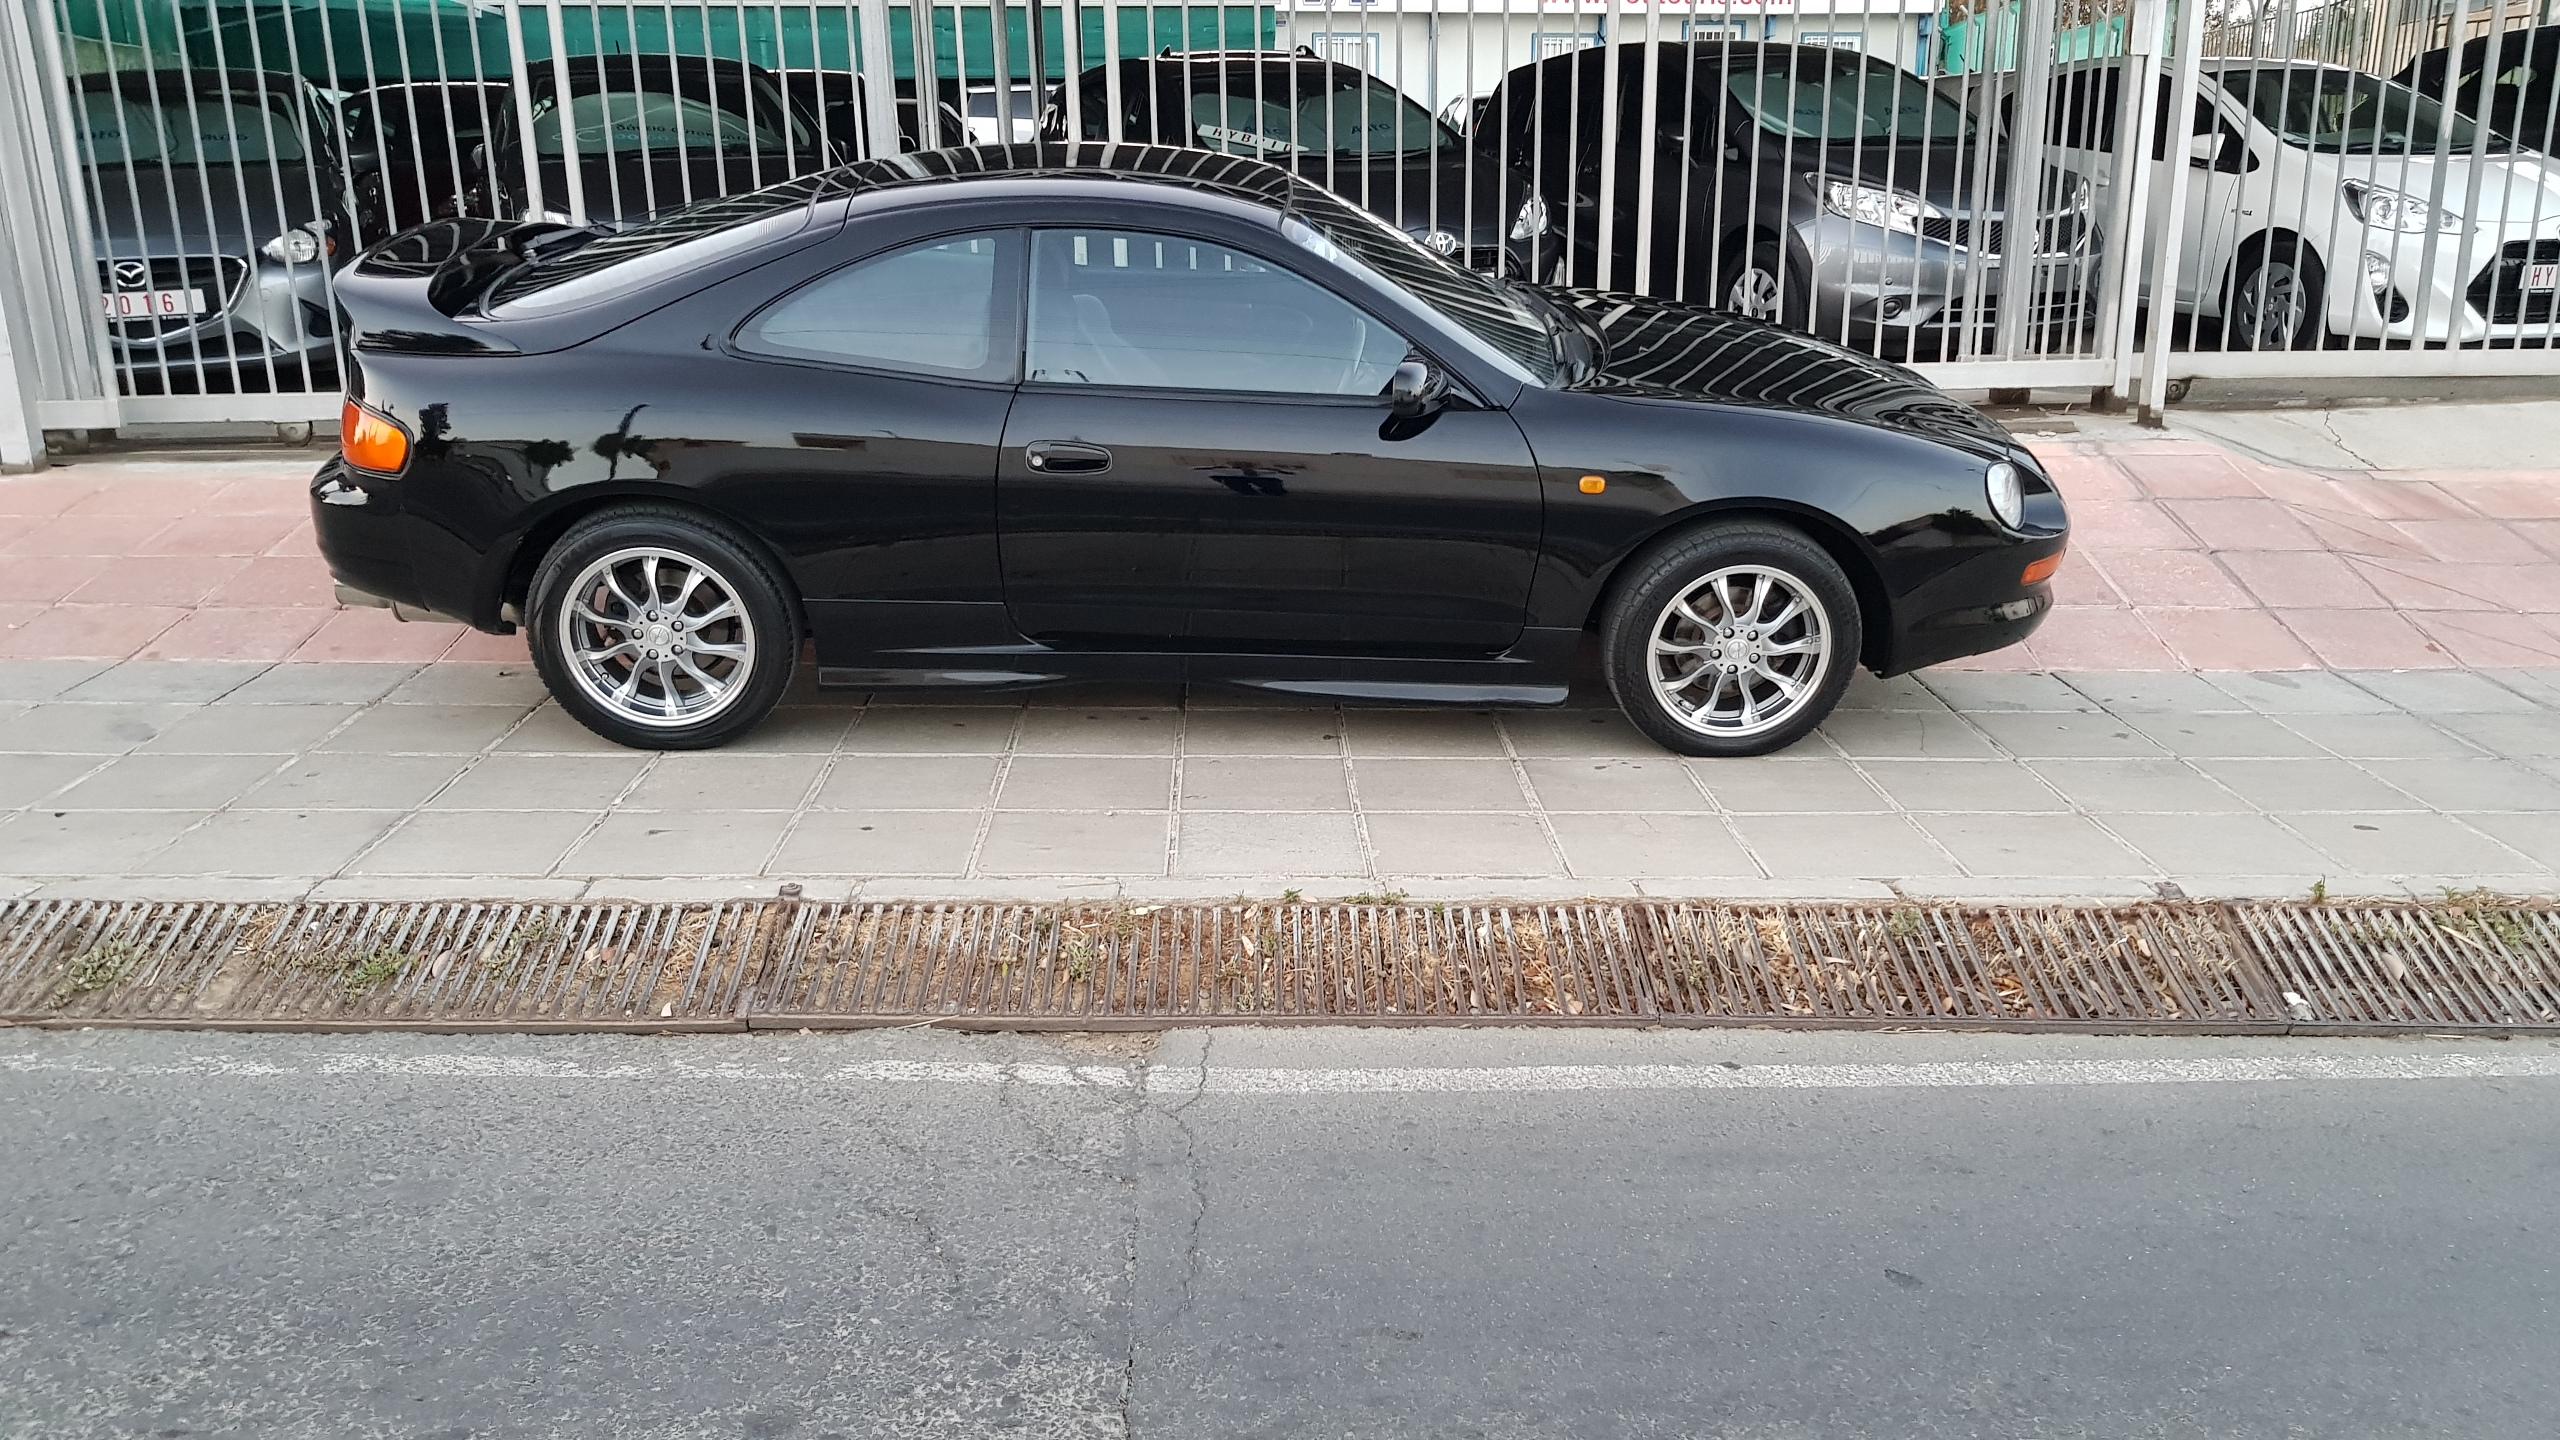 Toyota Celica SS2 Black 05